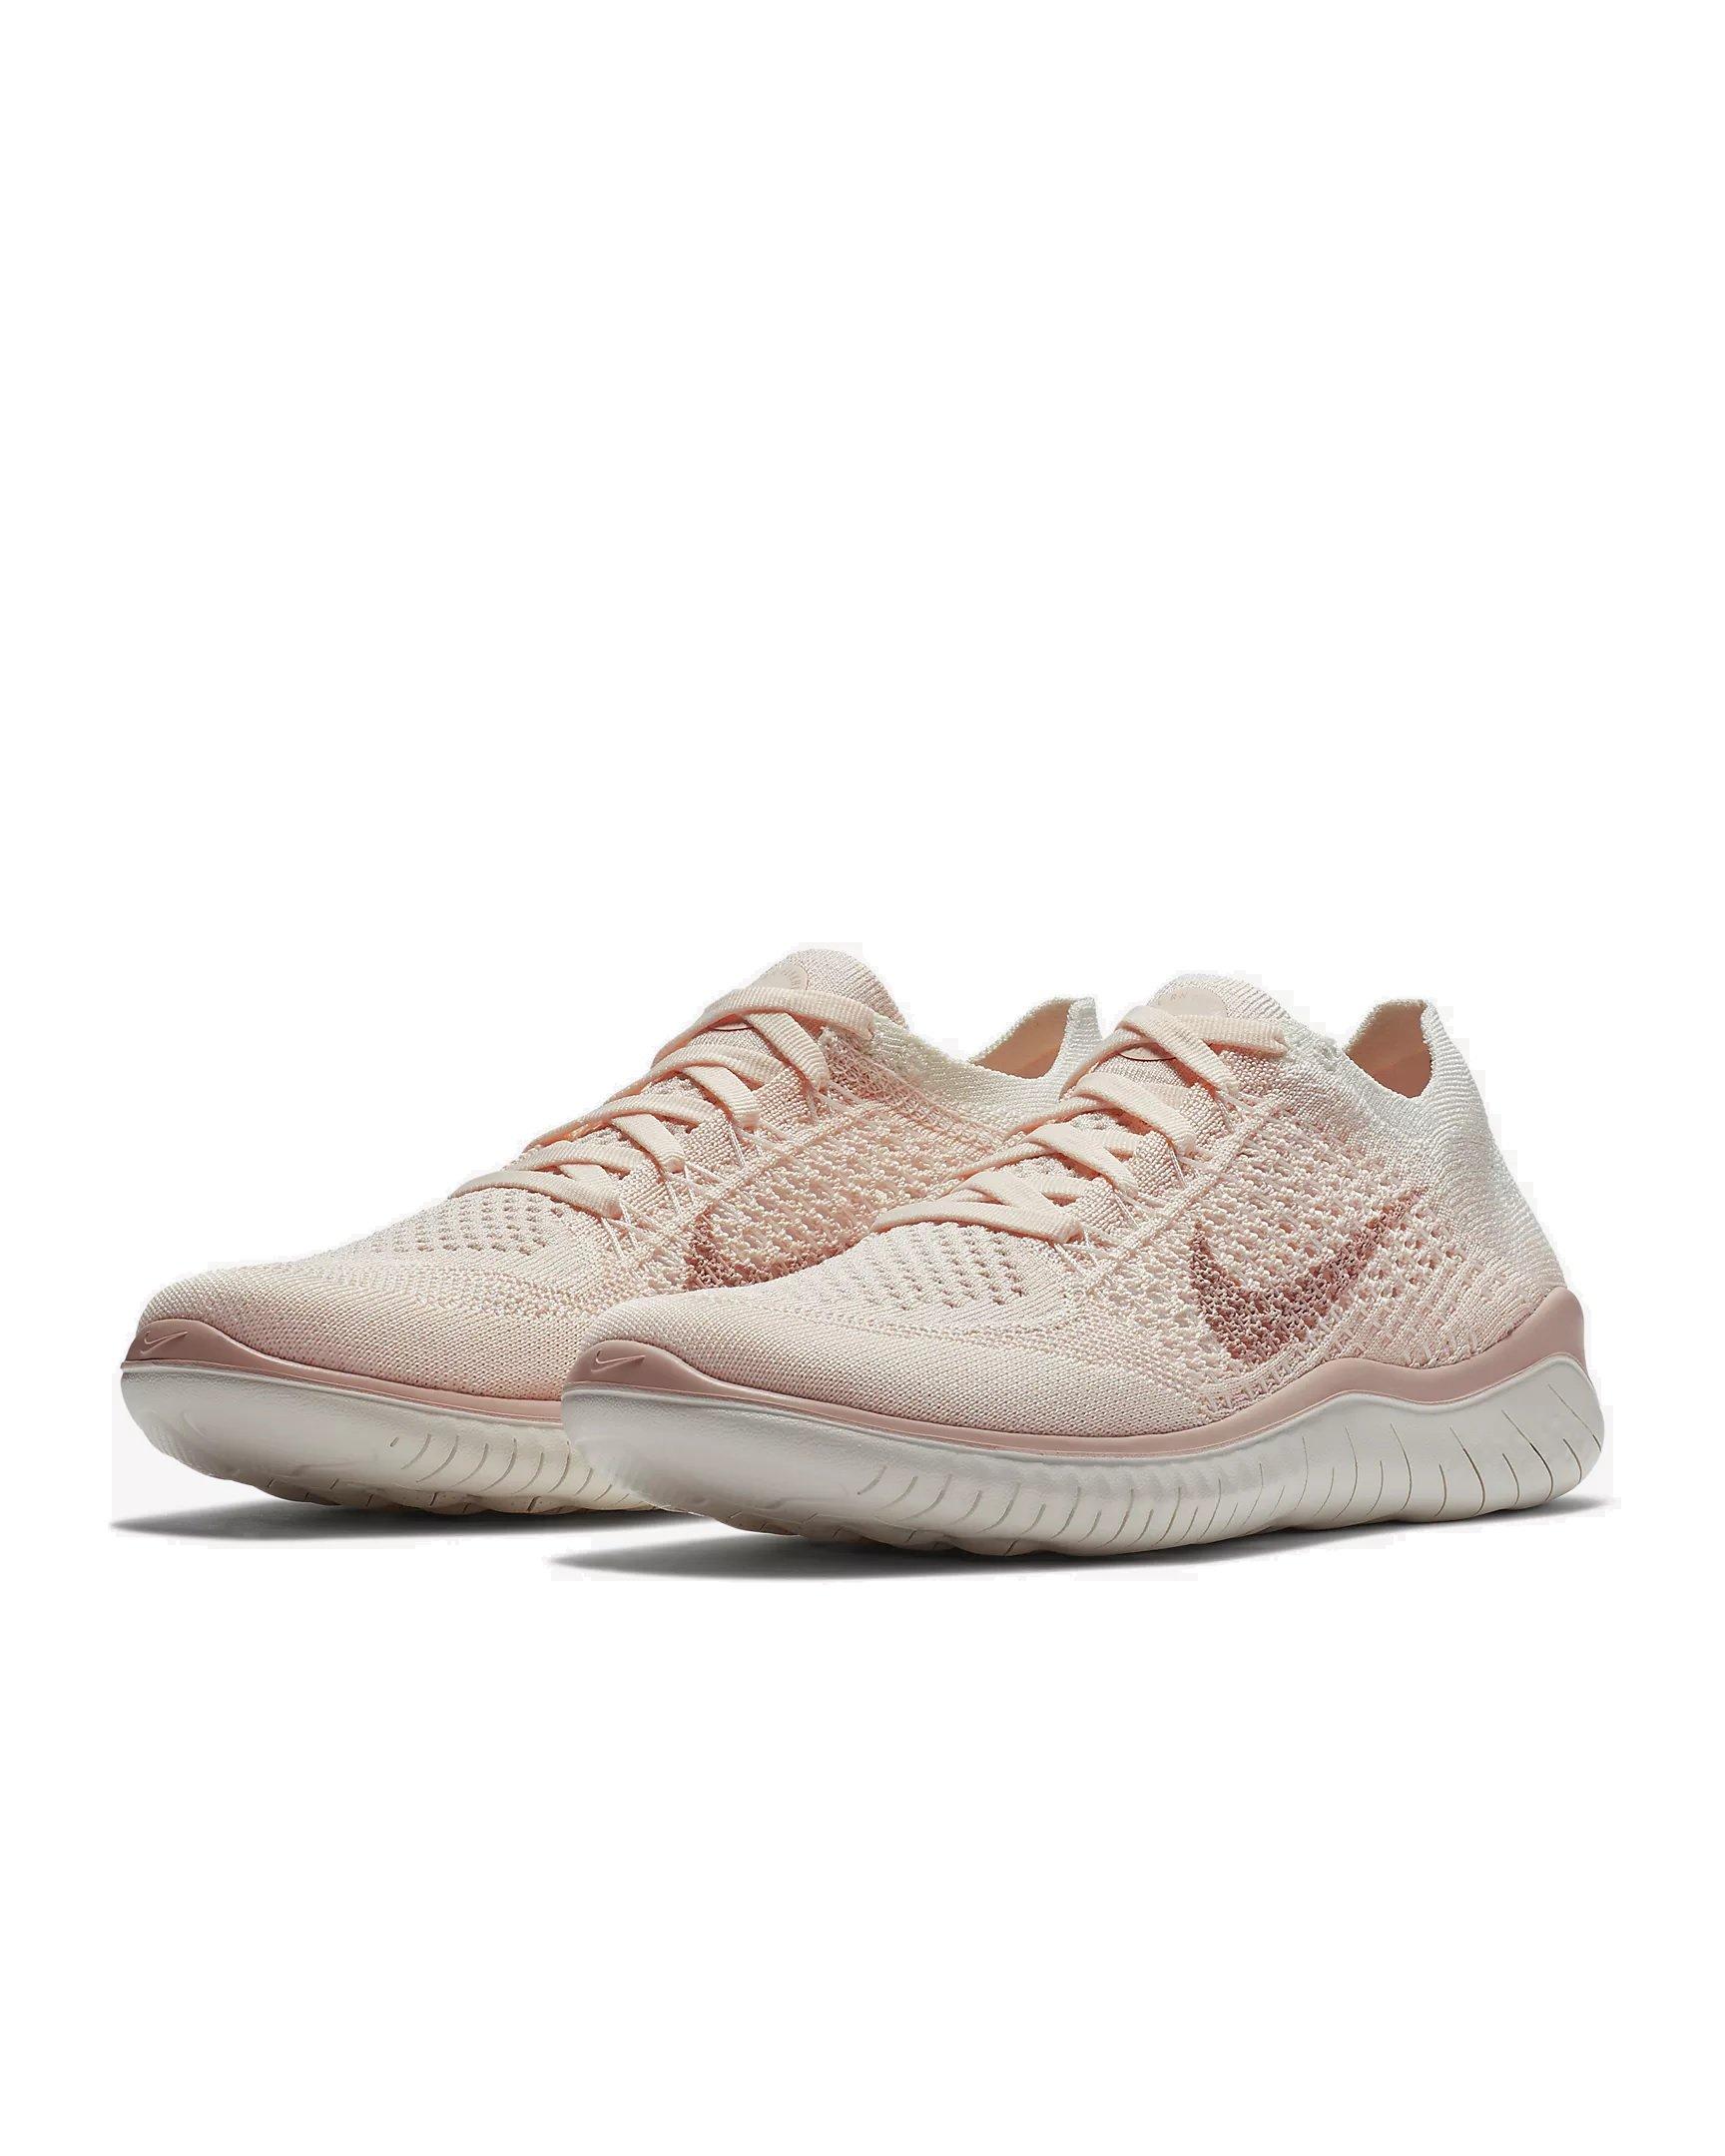 bfc89cdf91c54 Galleon - Nike 942839-802  Womens Free RN Flyknit 2018 Ice Beige Sail Pink  Running Shoes (8.5 B(M) US Women)